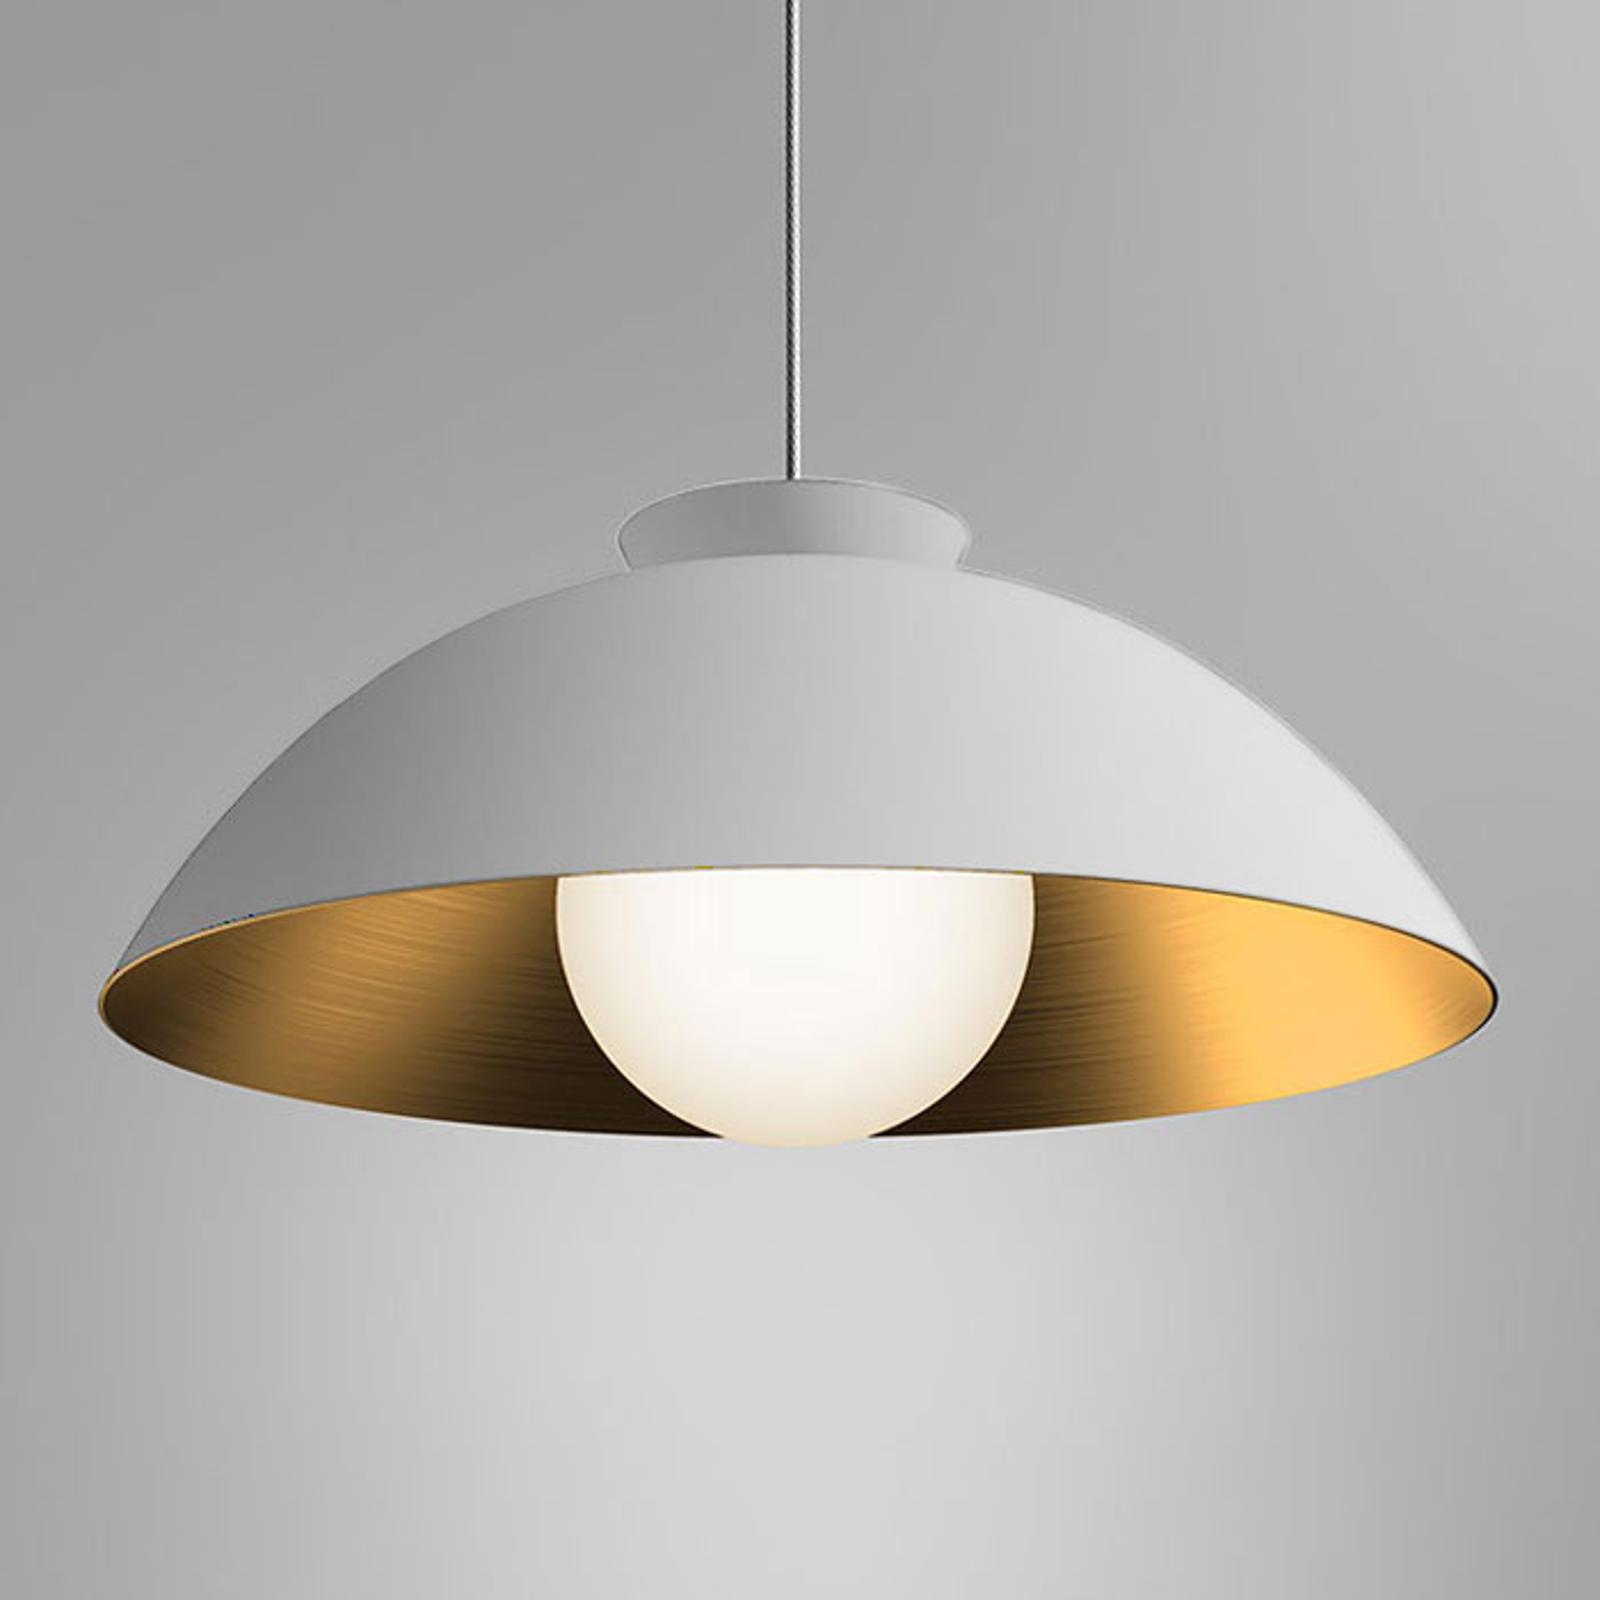 Innermost Chelsea - lampa wisząca Ø 56cm biała